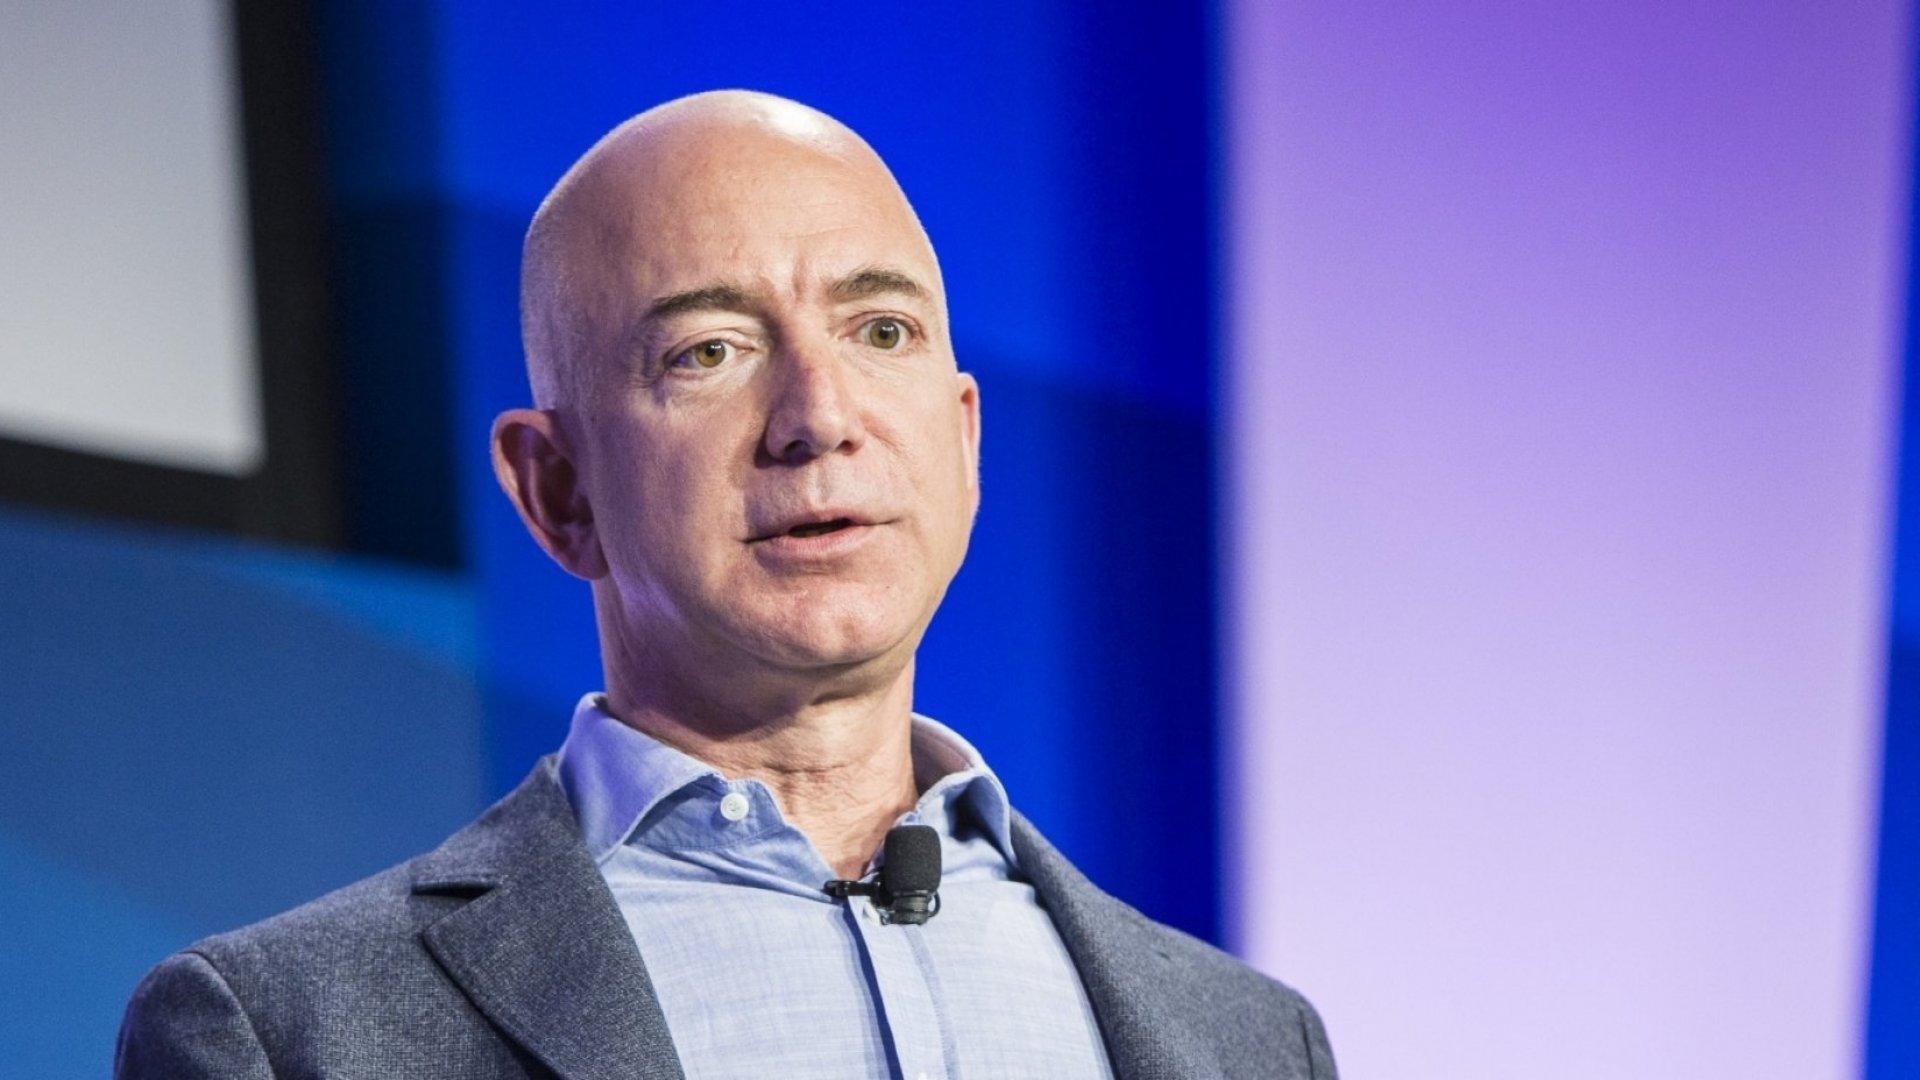 Jeff Bezos Gives $ 10 Billion To Fight Climate Change